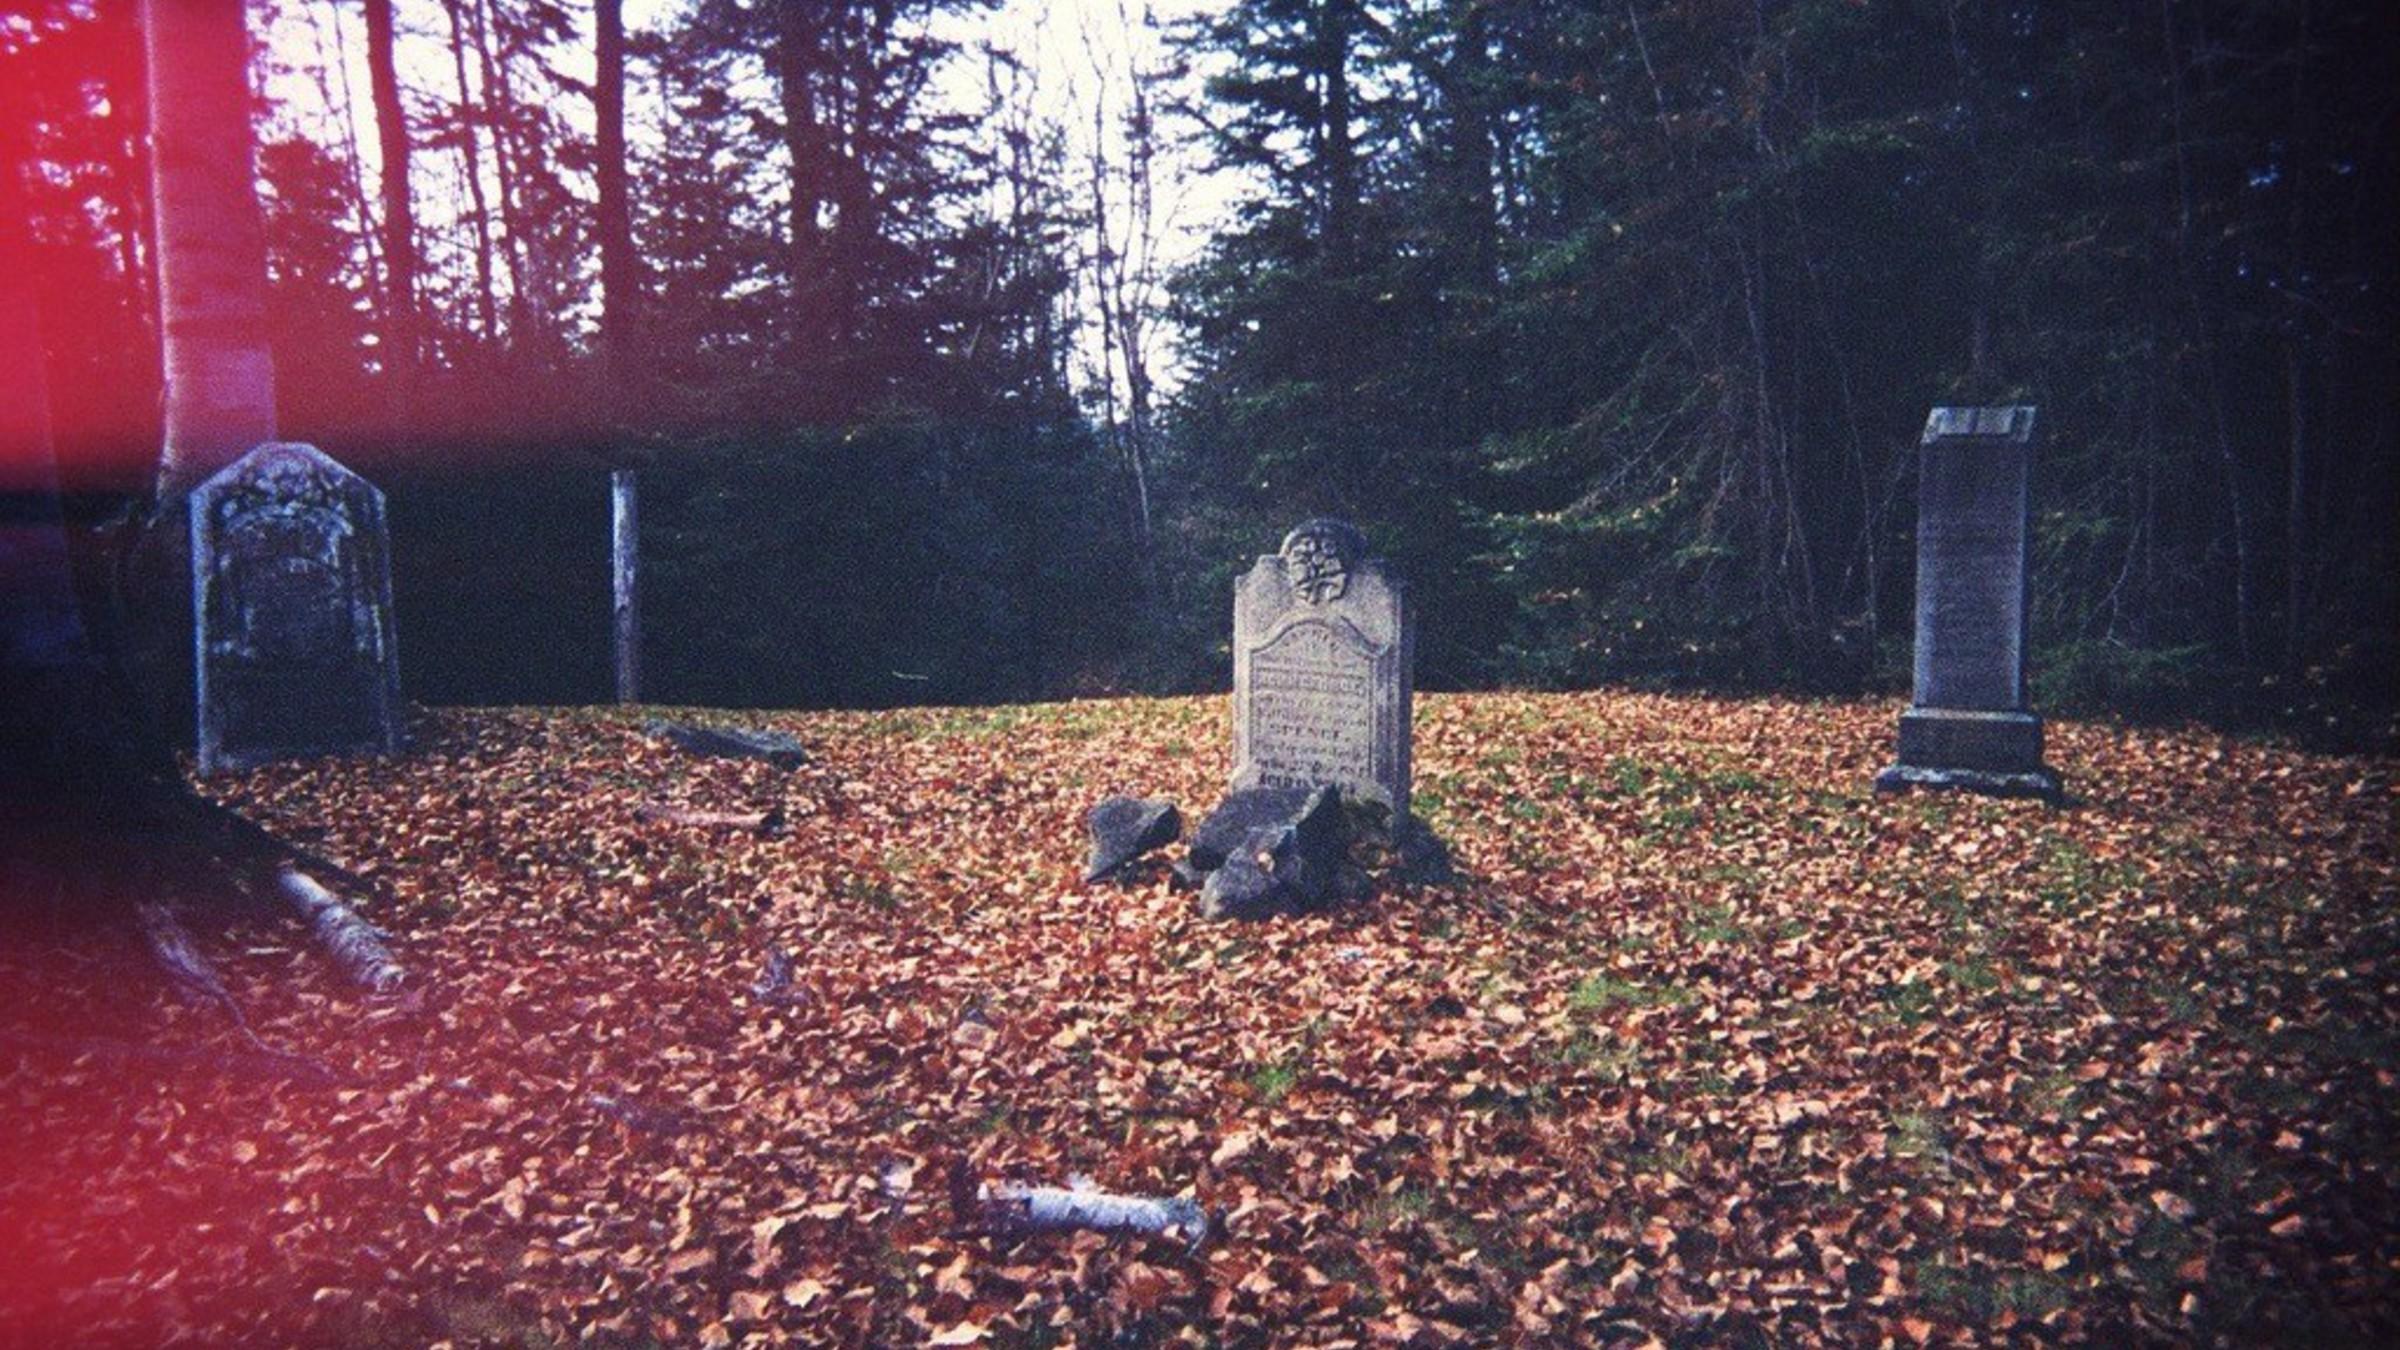 Autumn Leaves Graves Cemetery Fallen Headstone Wallpaper 2400x1350